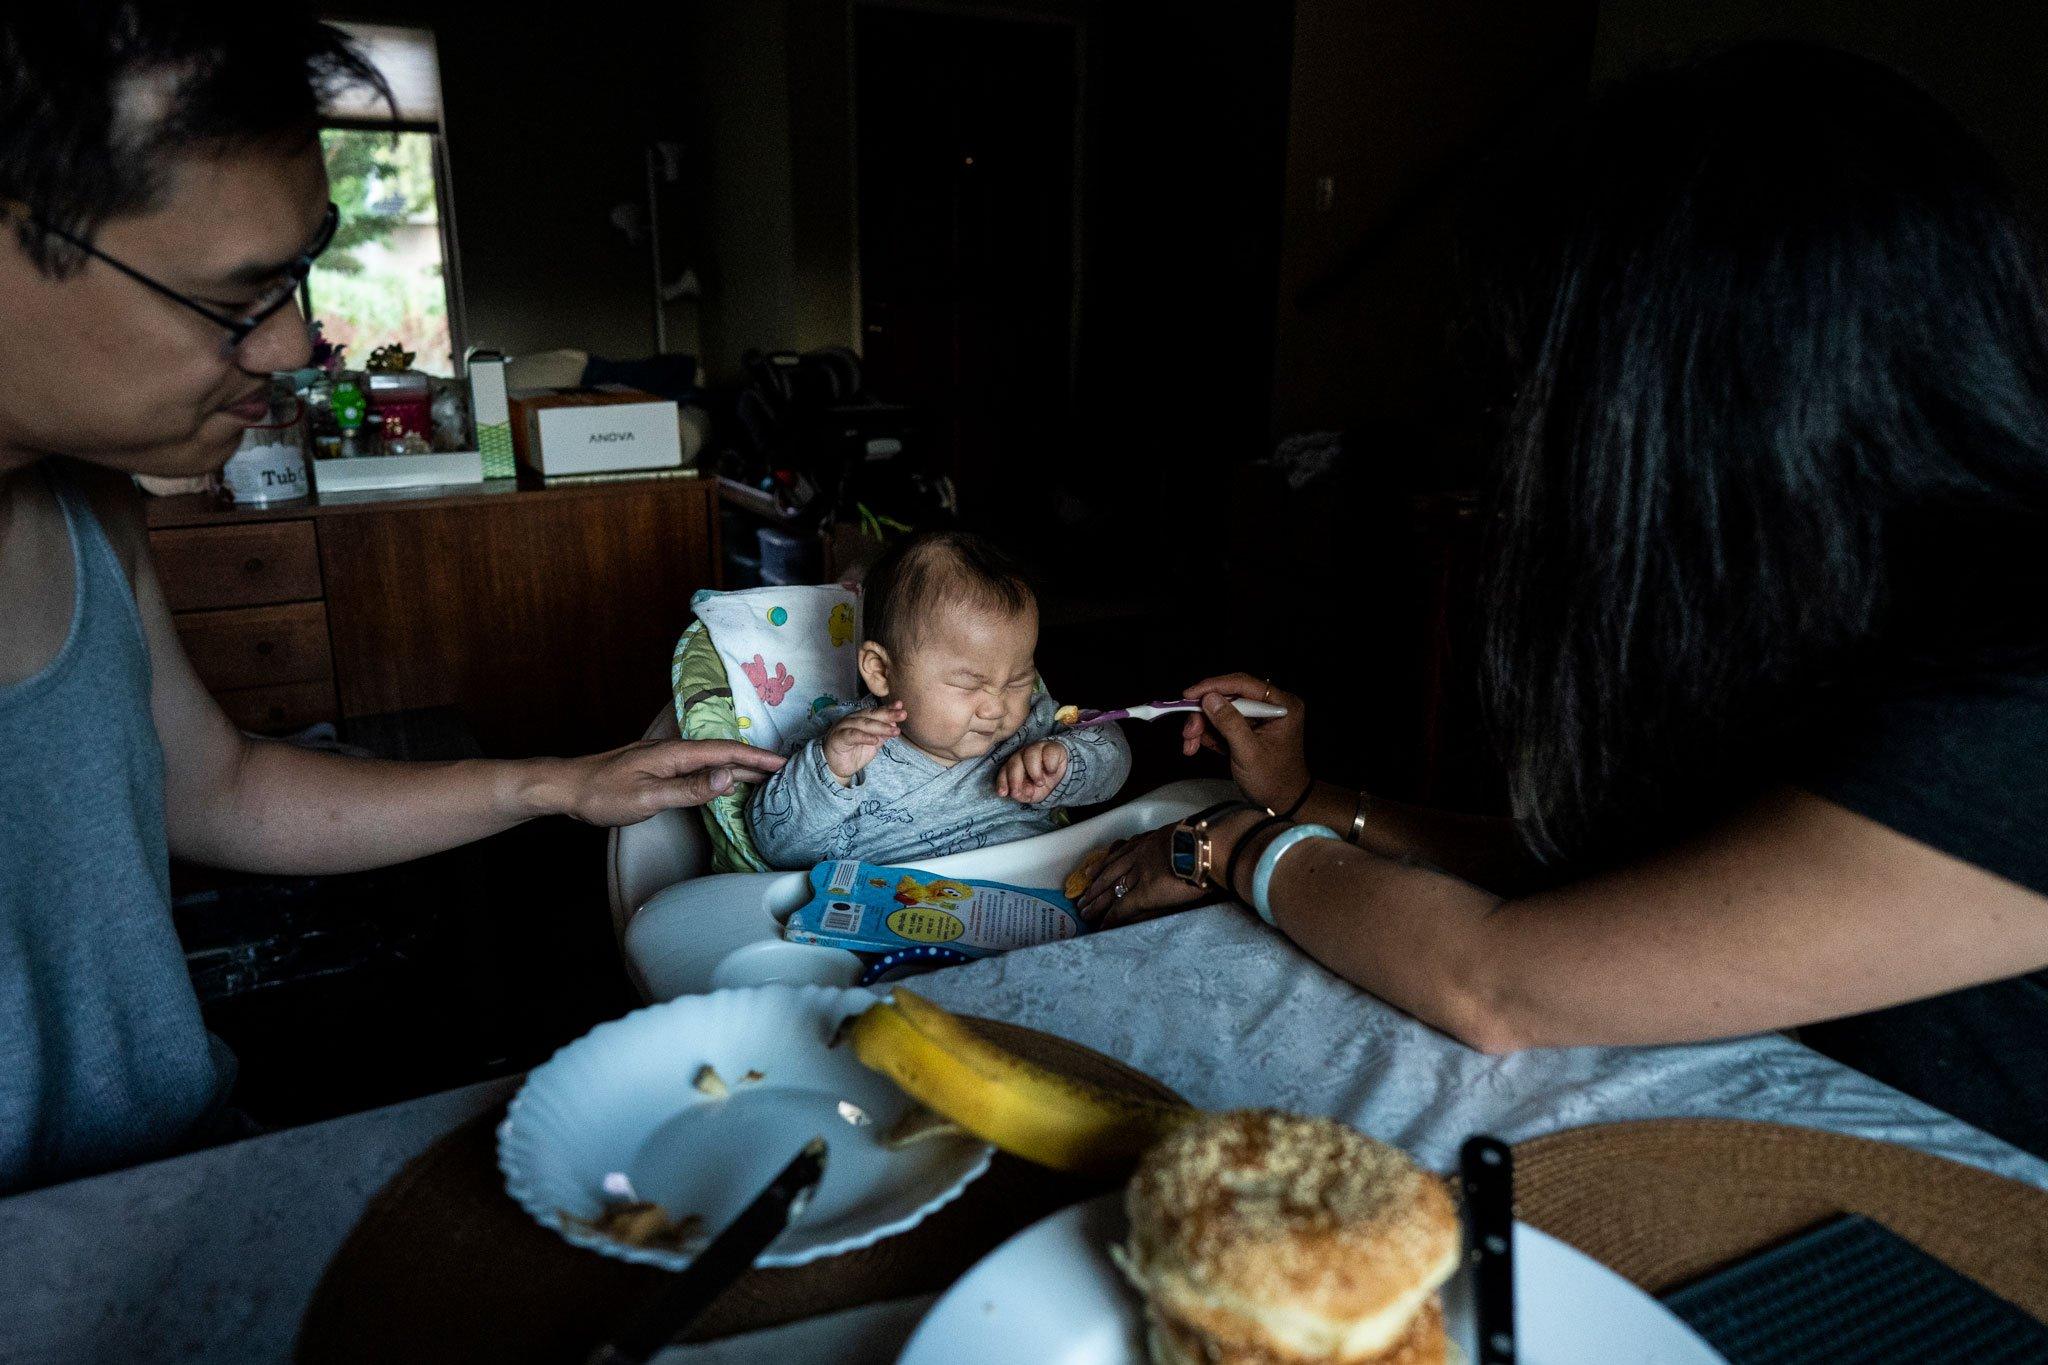 baby refusing food